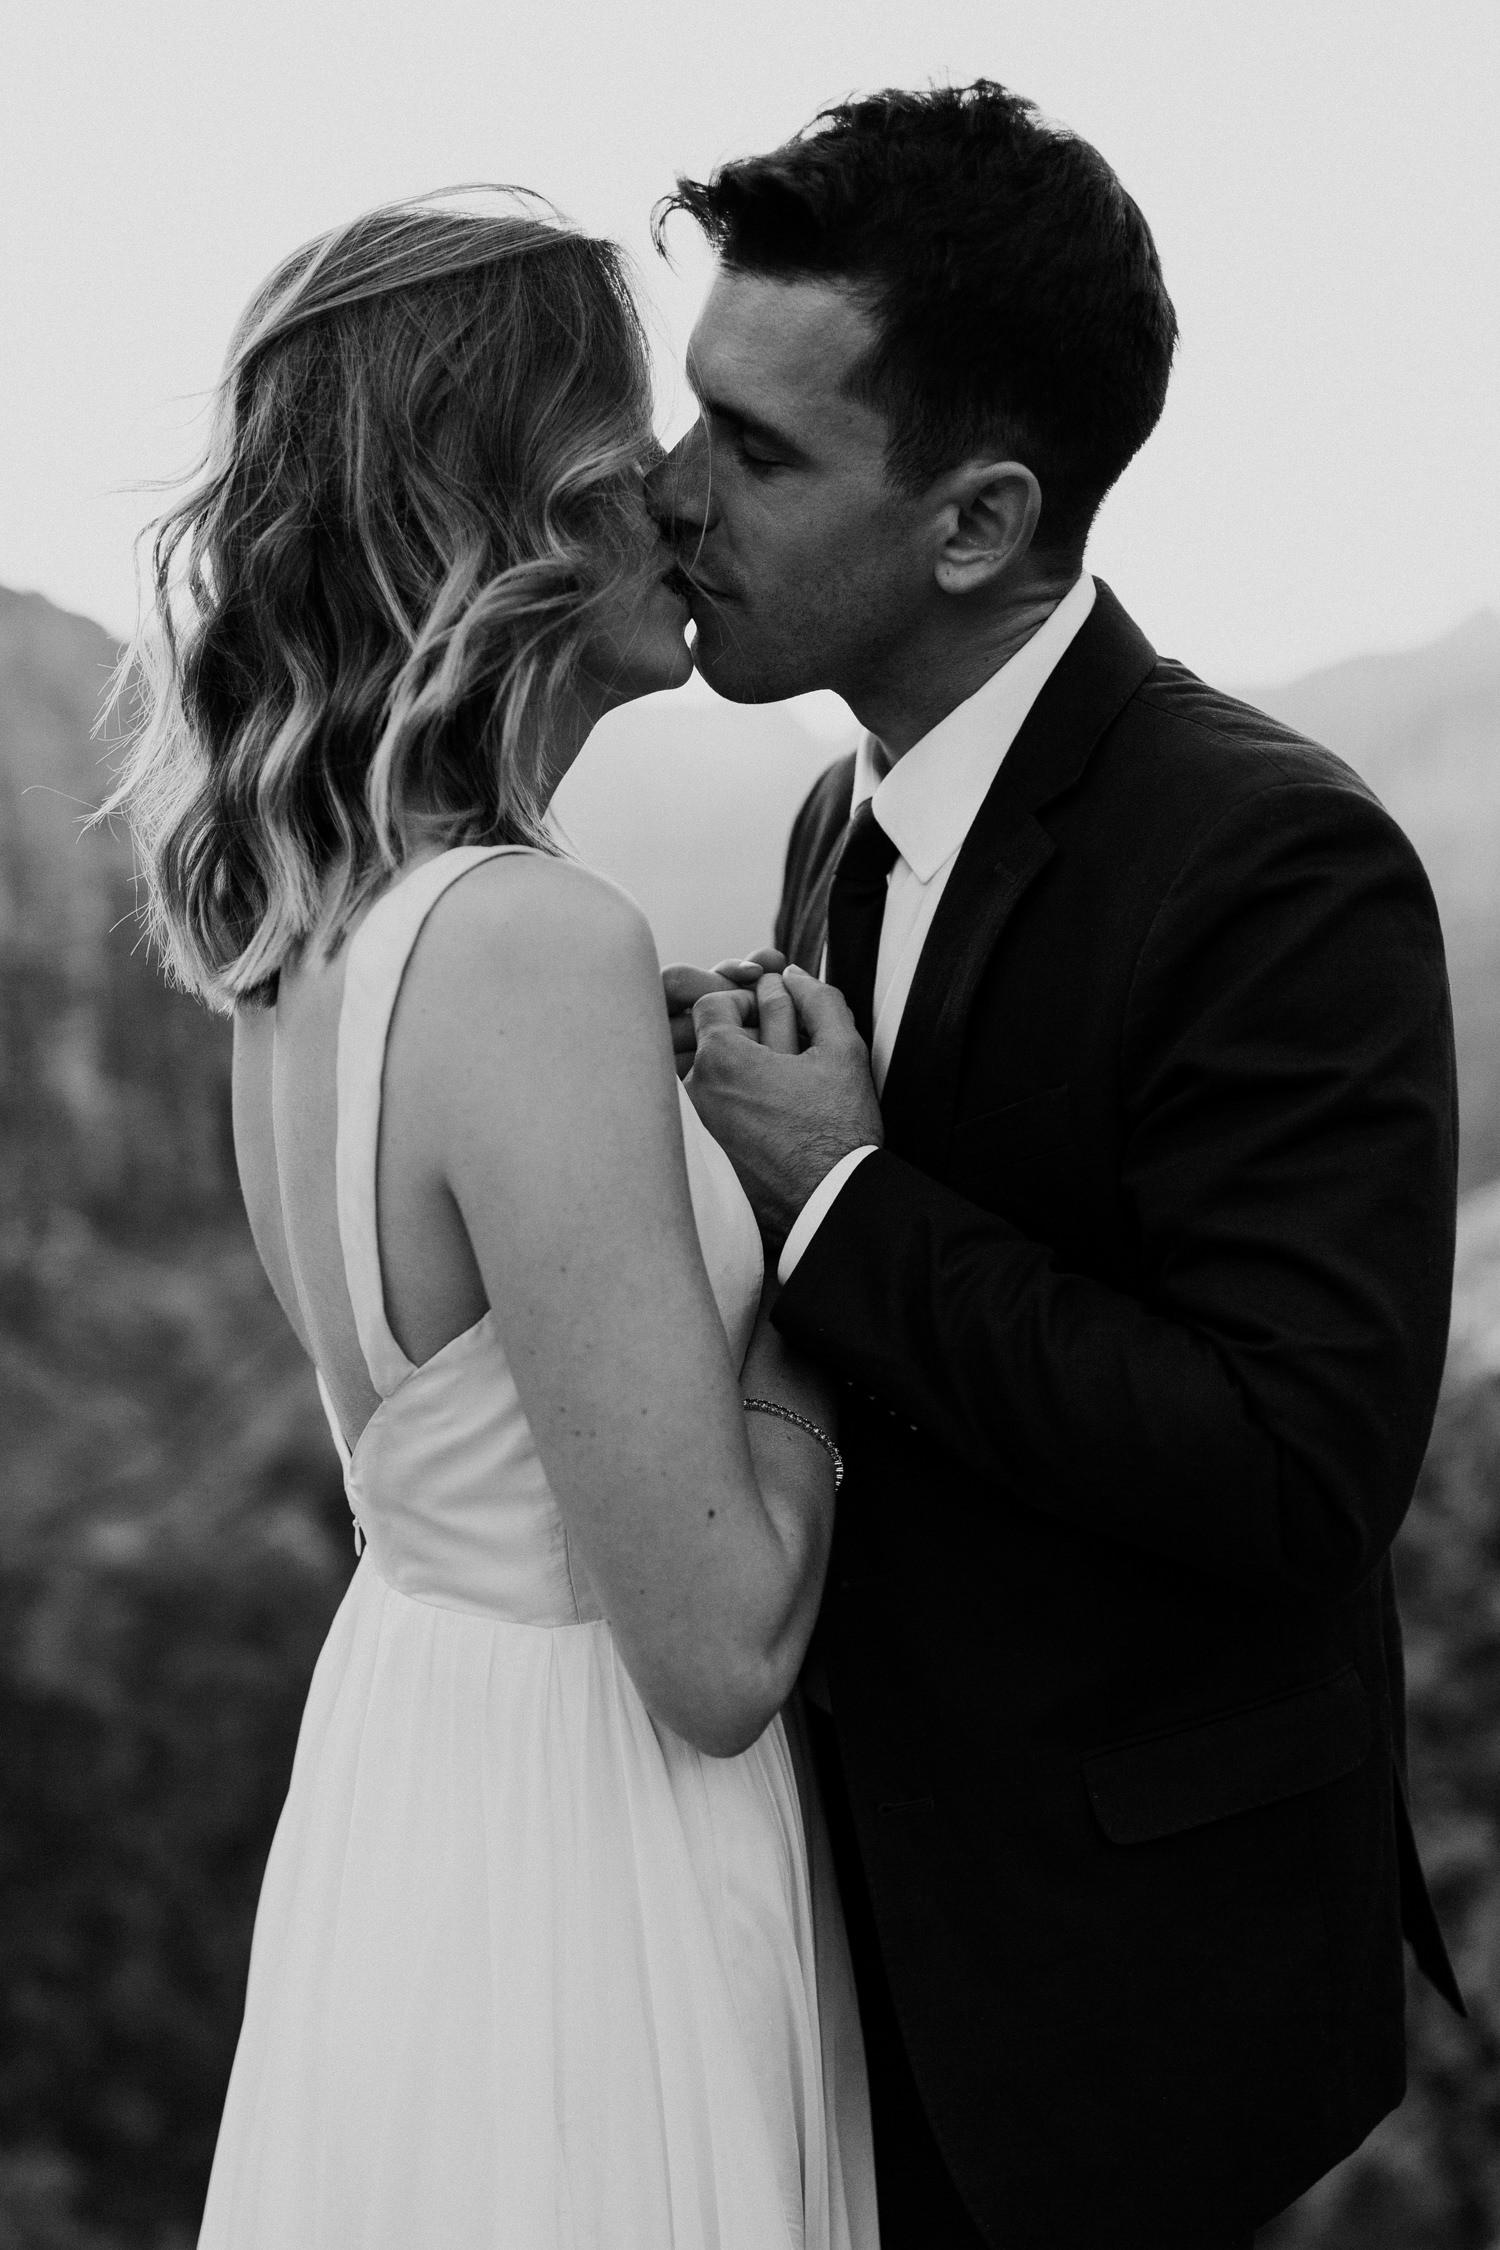 zion-national-park-wedding-116.jpg